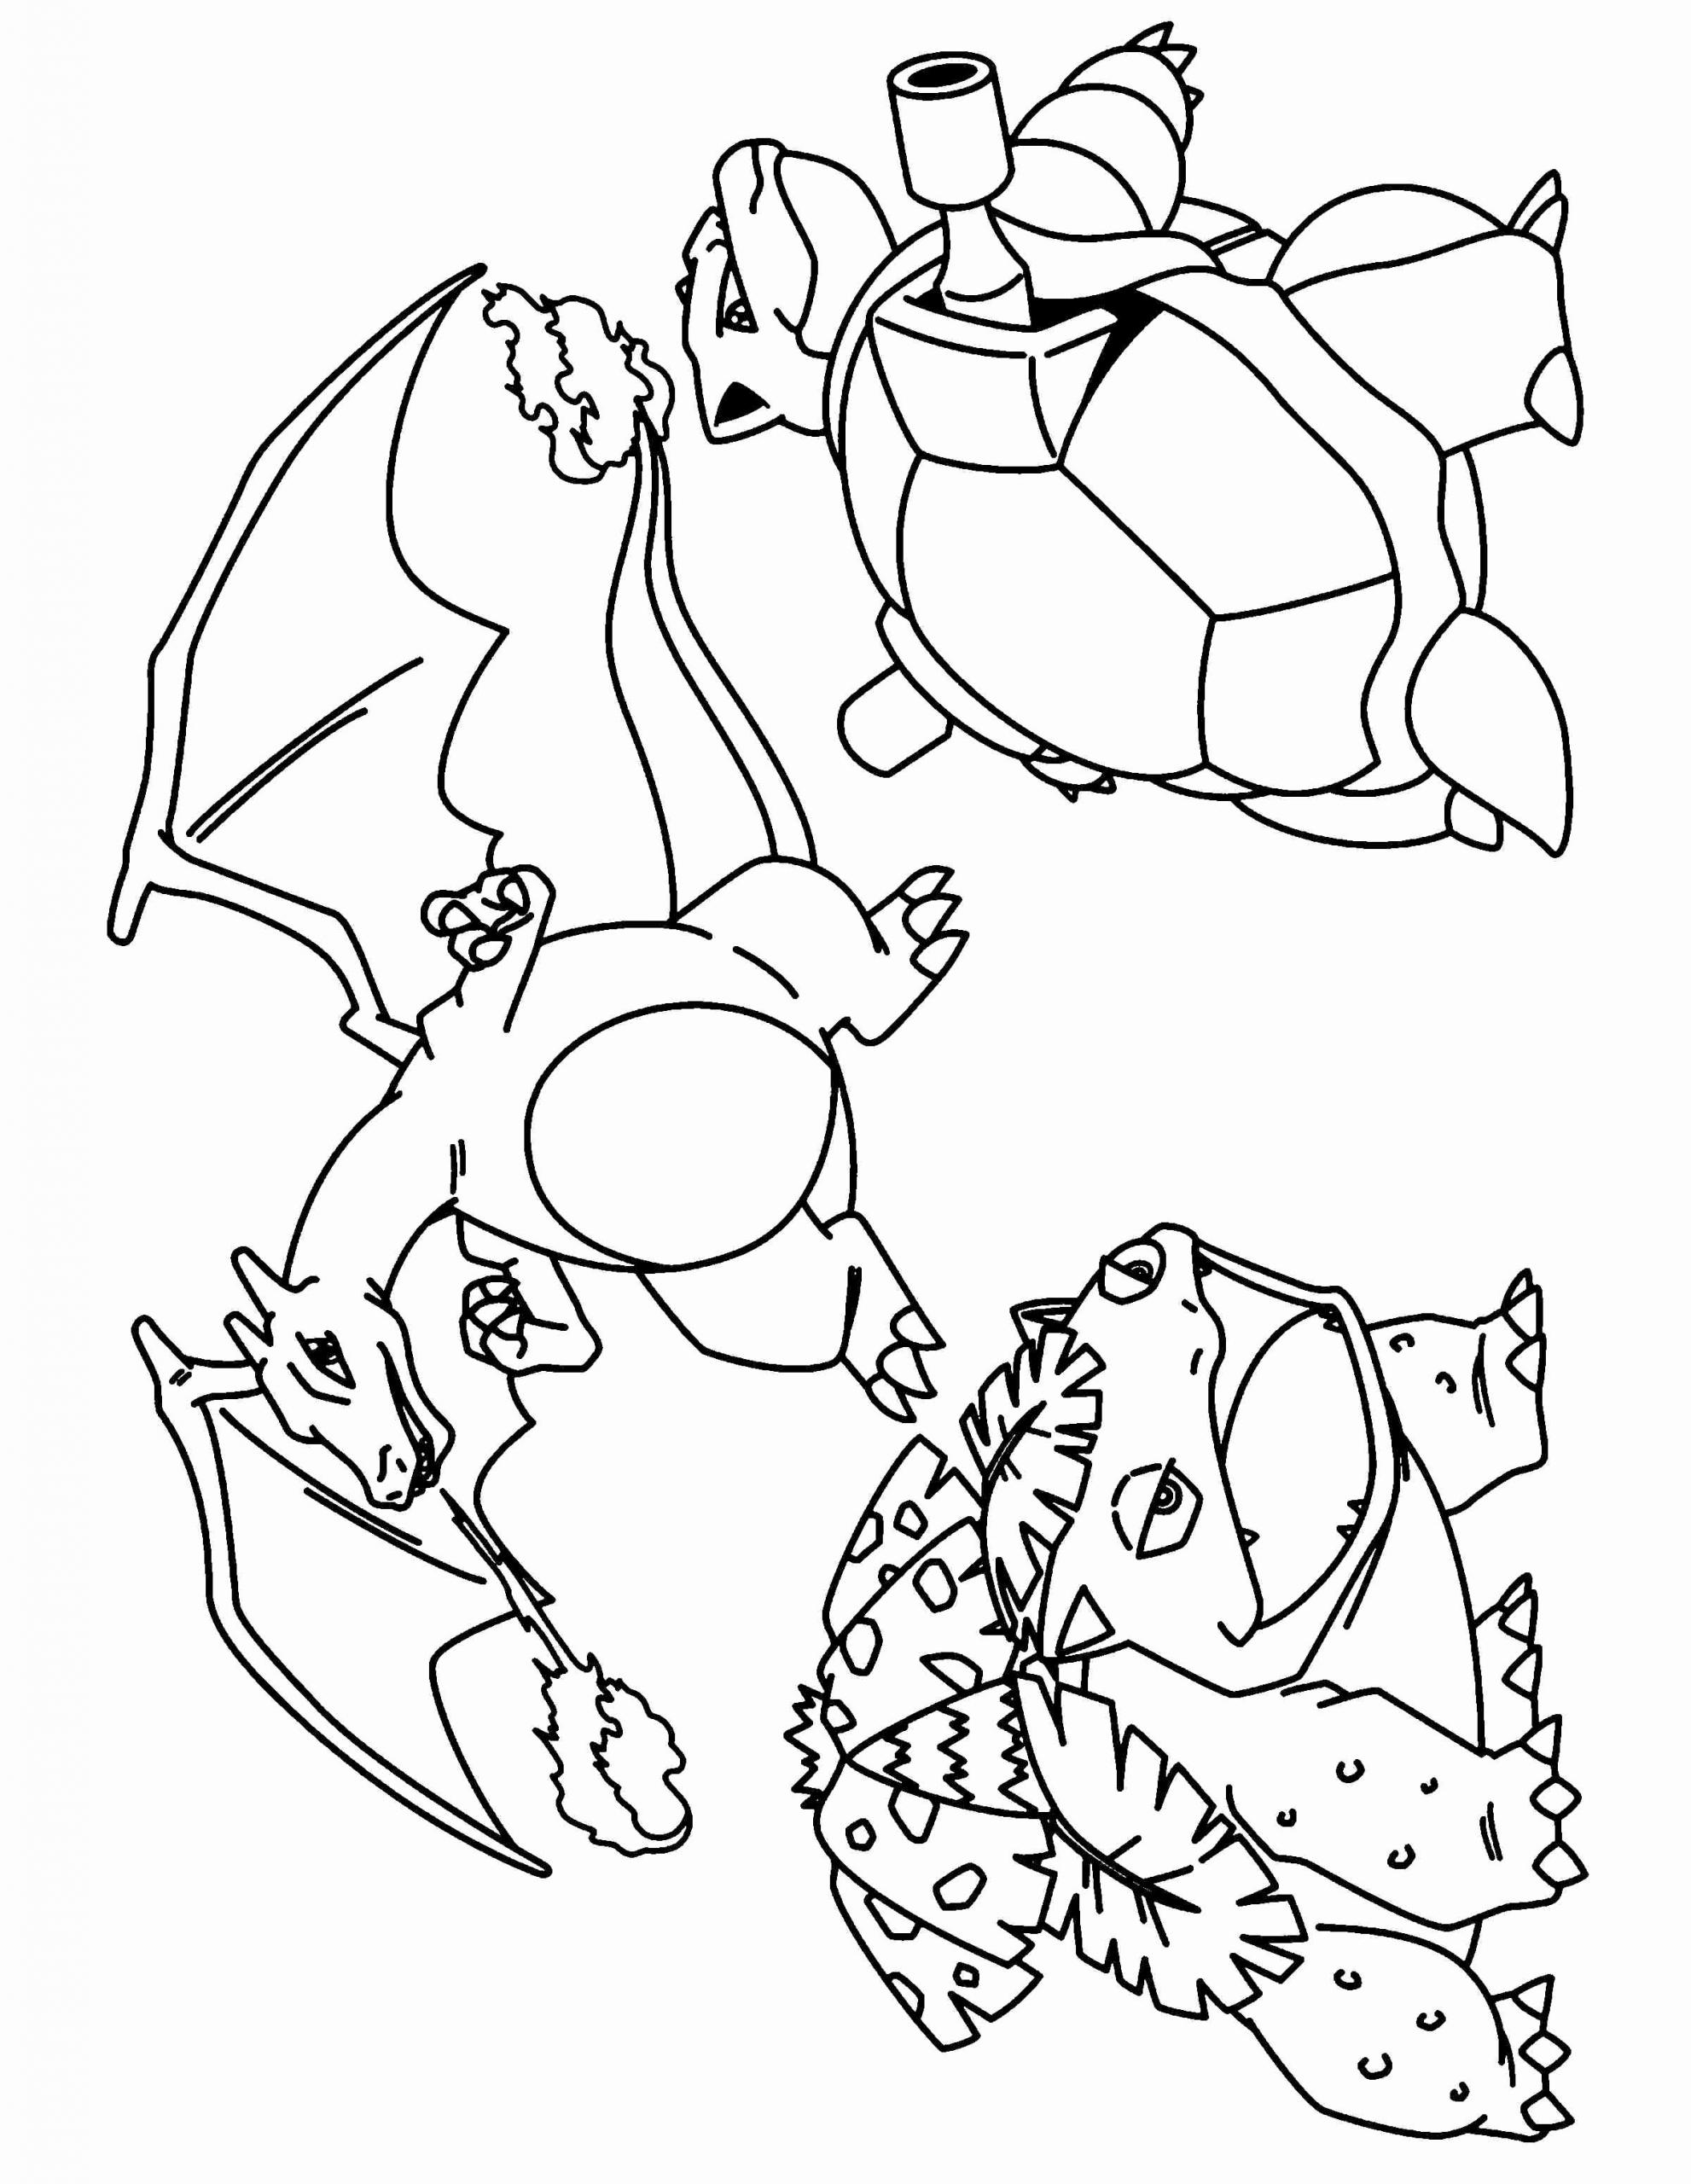 Pokemon Mega Venasaur Coloring Pages For Kids In 2020 Pokemon Coloring Pages Pokemon Coloring Pokemon Coloring Sheets